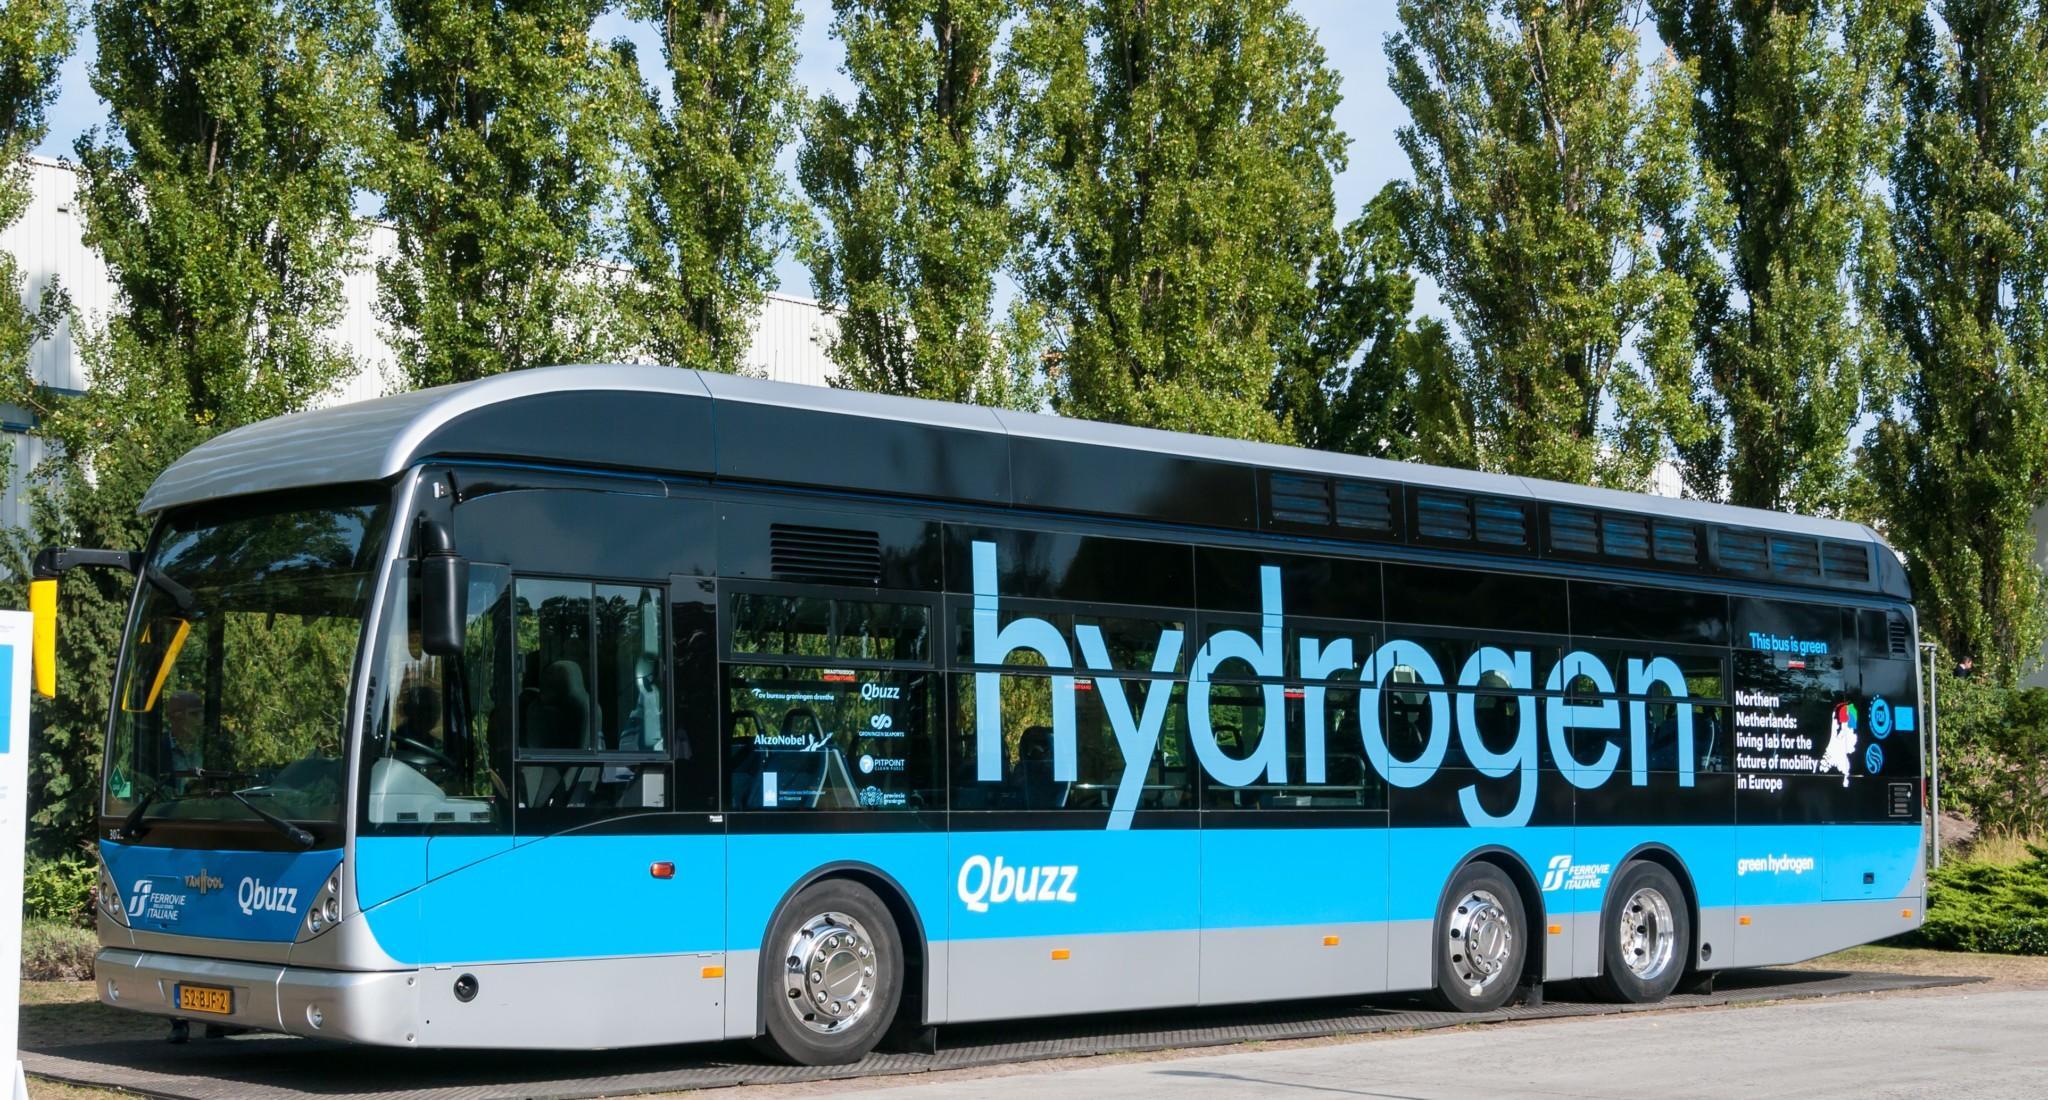 transports propres hydrogene vert plan relance - L'Energeek